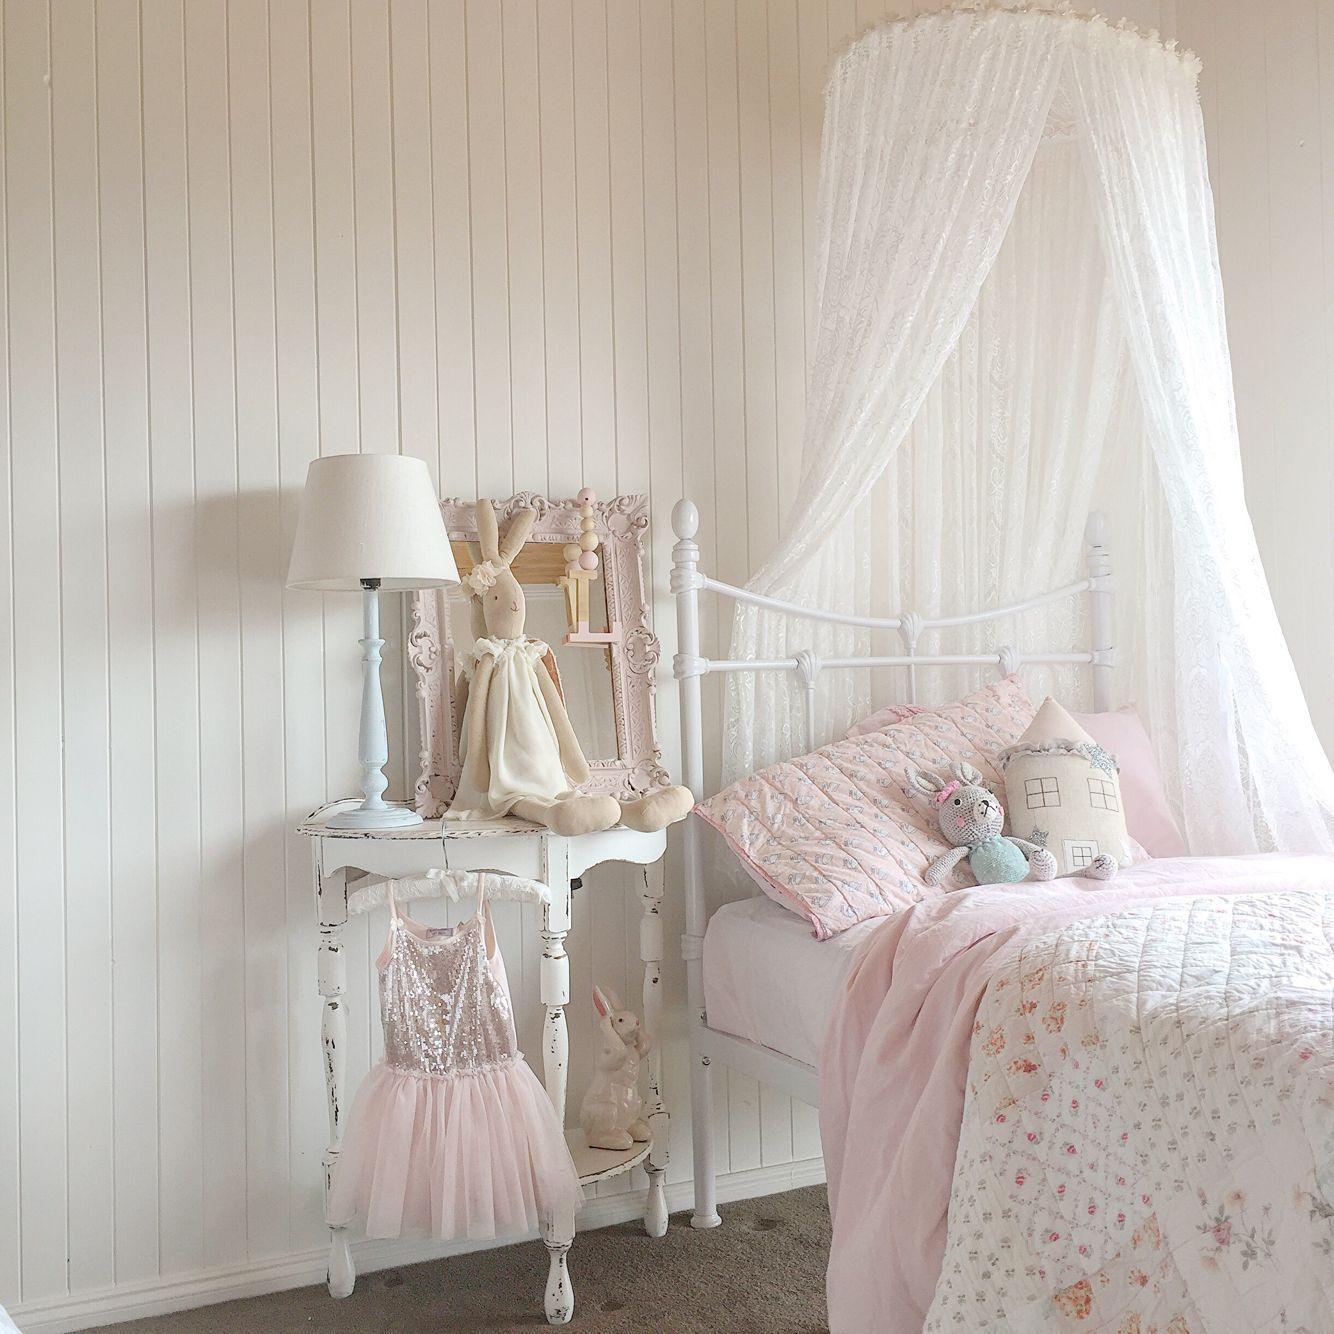 White lace bedroom curtains - White Lace Valances